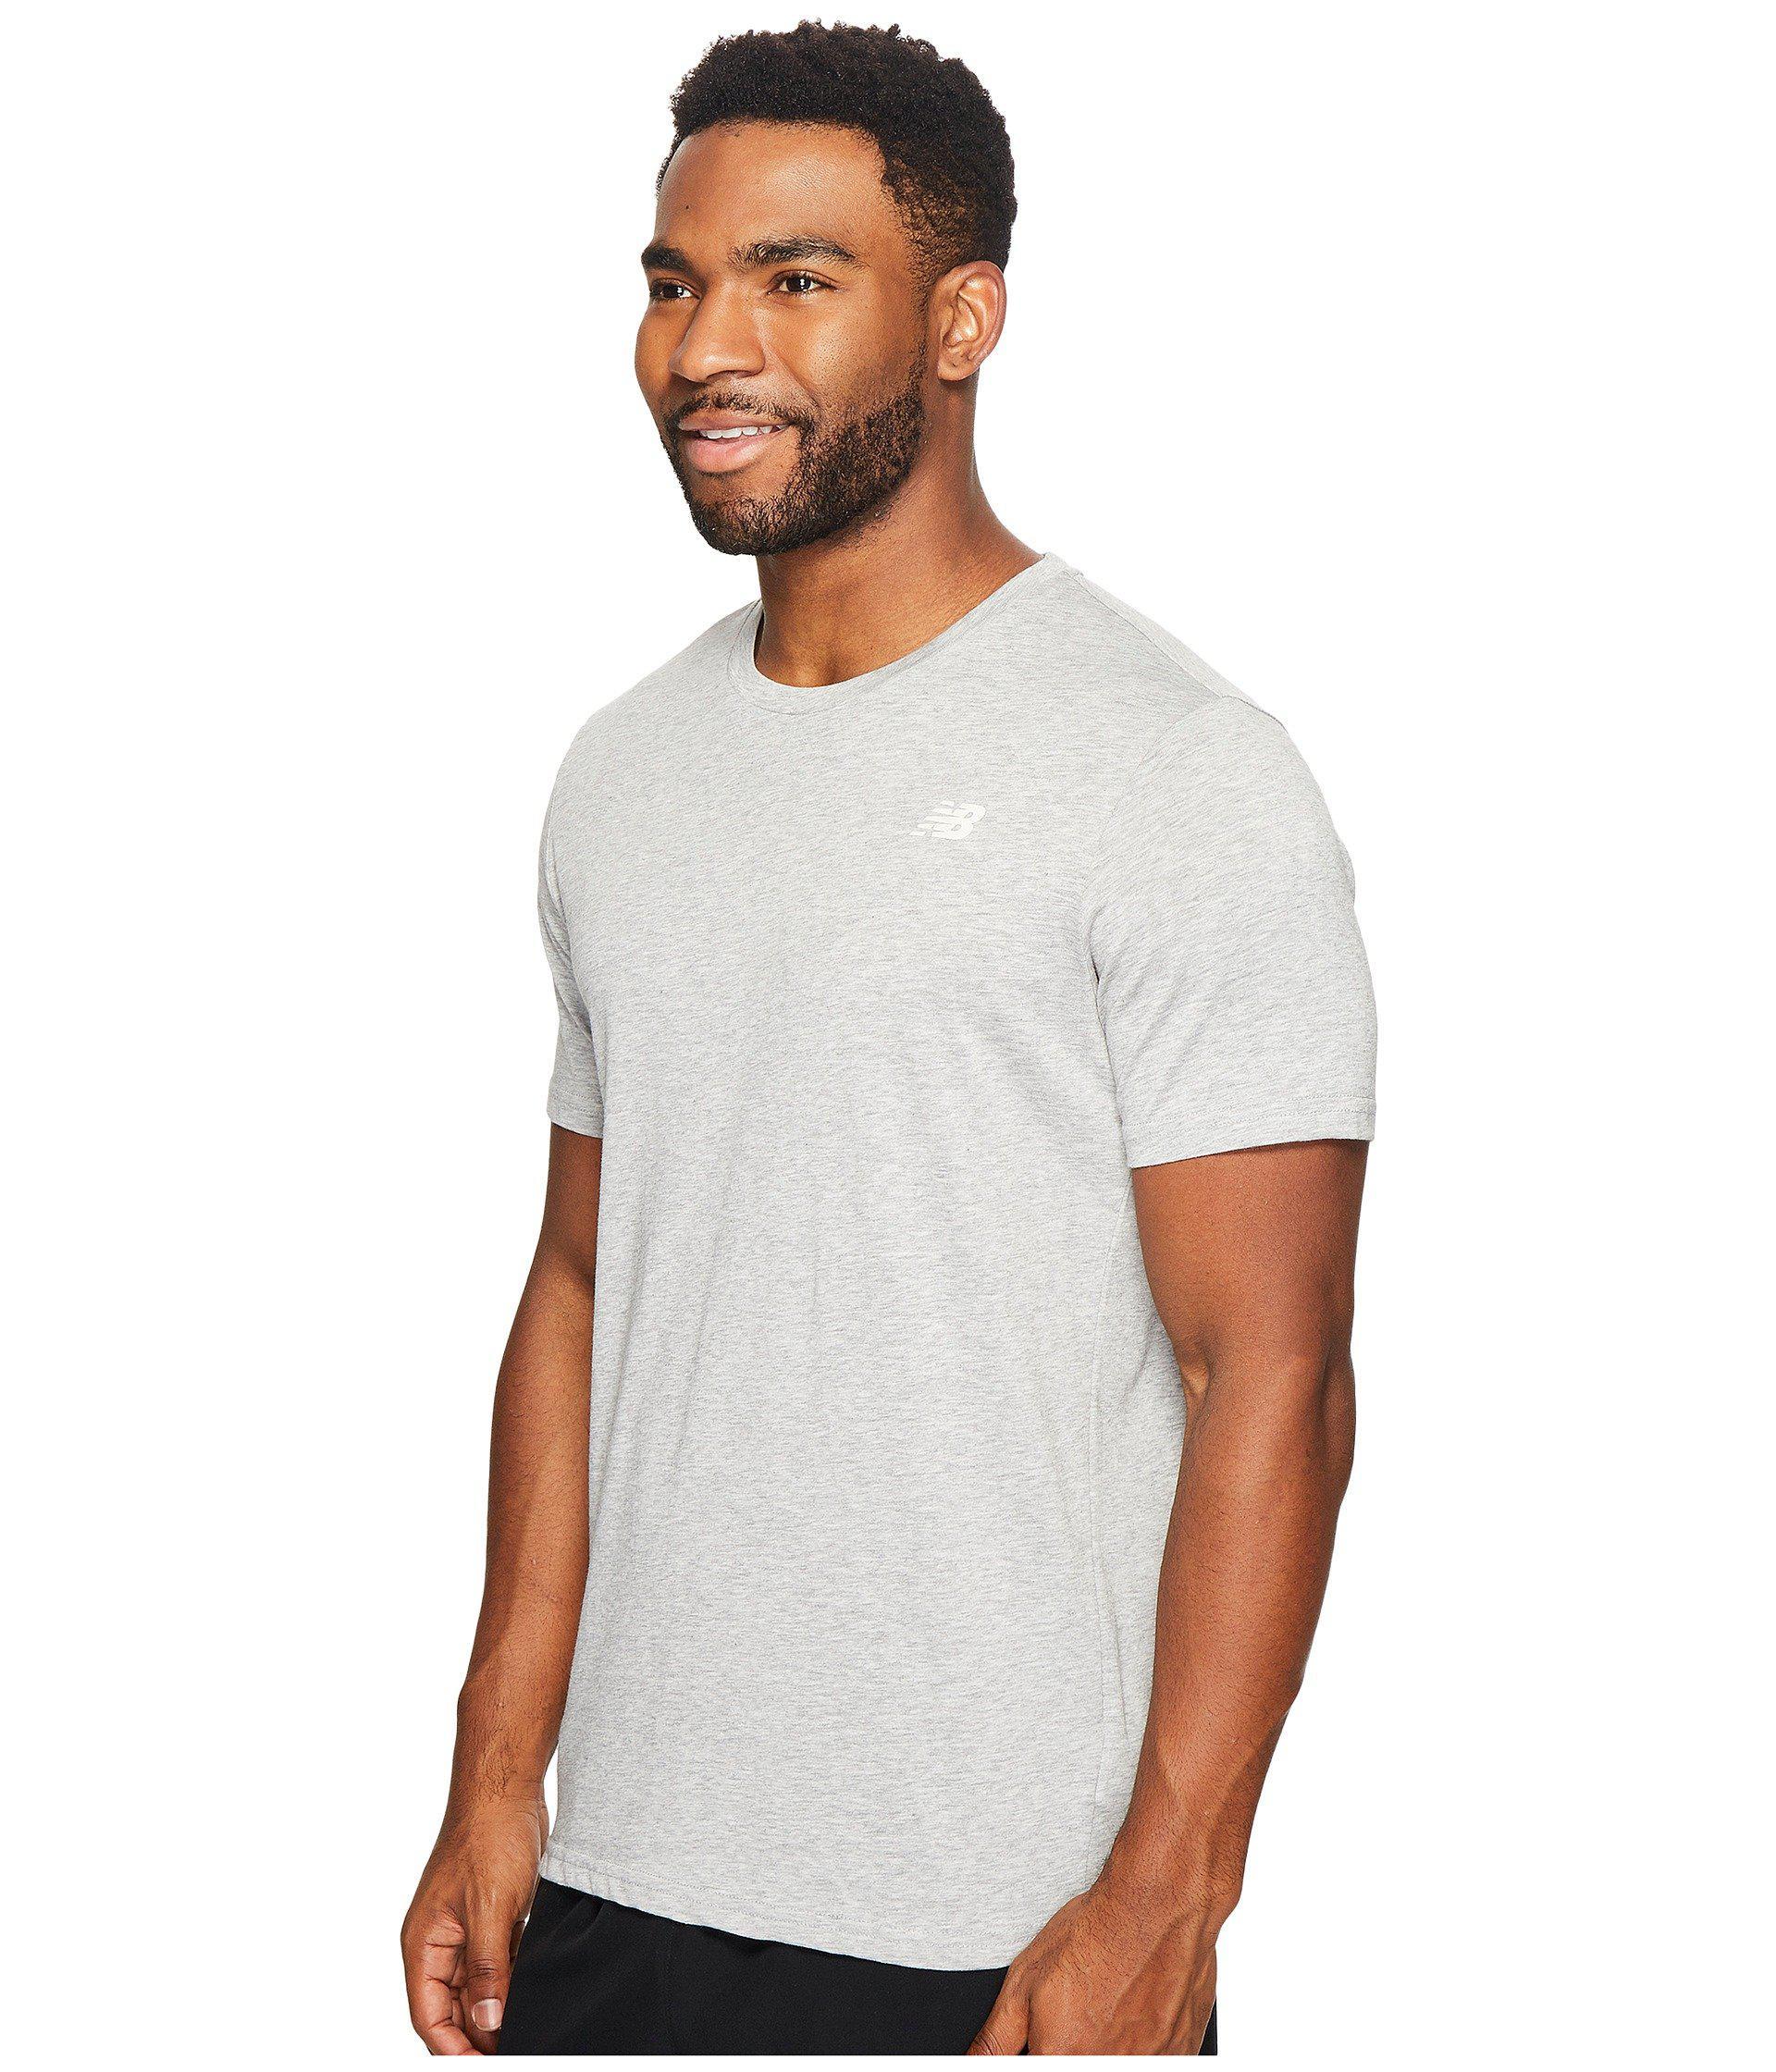 5799b6d1 New Balance Heather Tech Short Sleeve (pigment) Men's T Shirt in Gray for  Men - Lyst